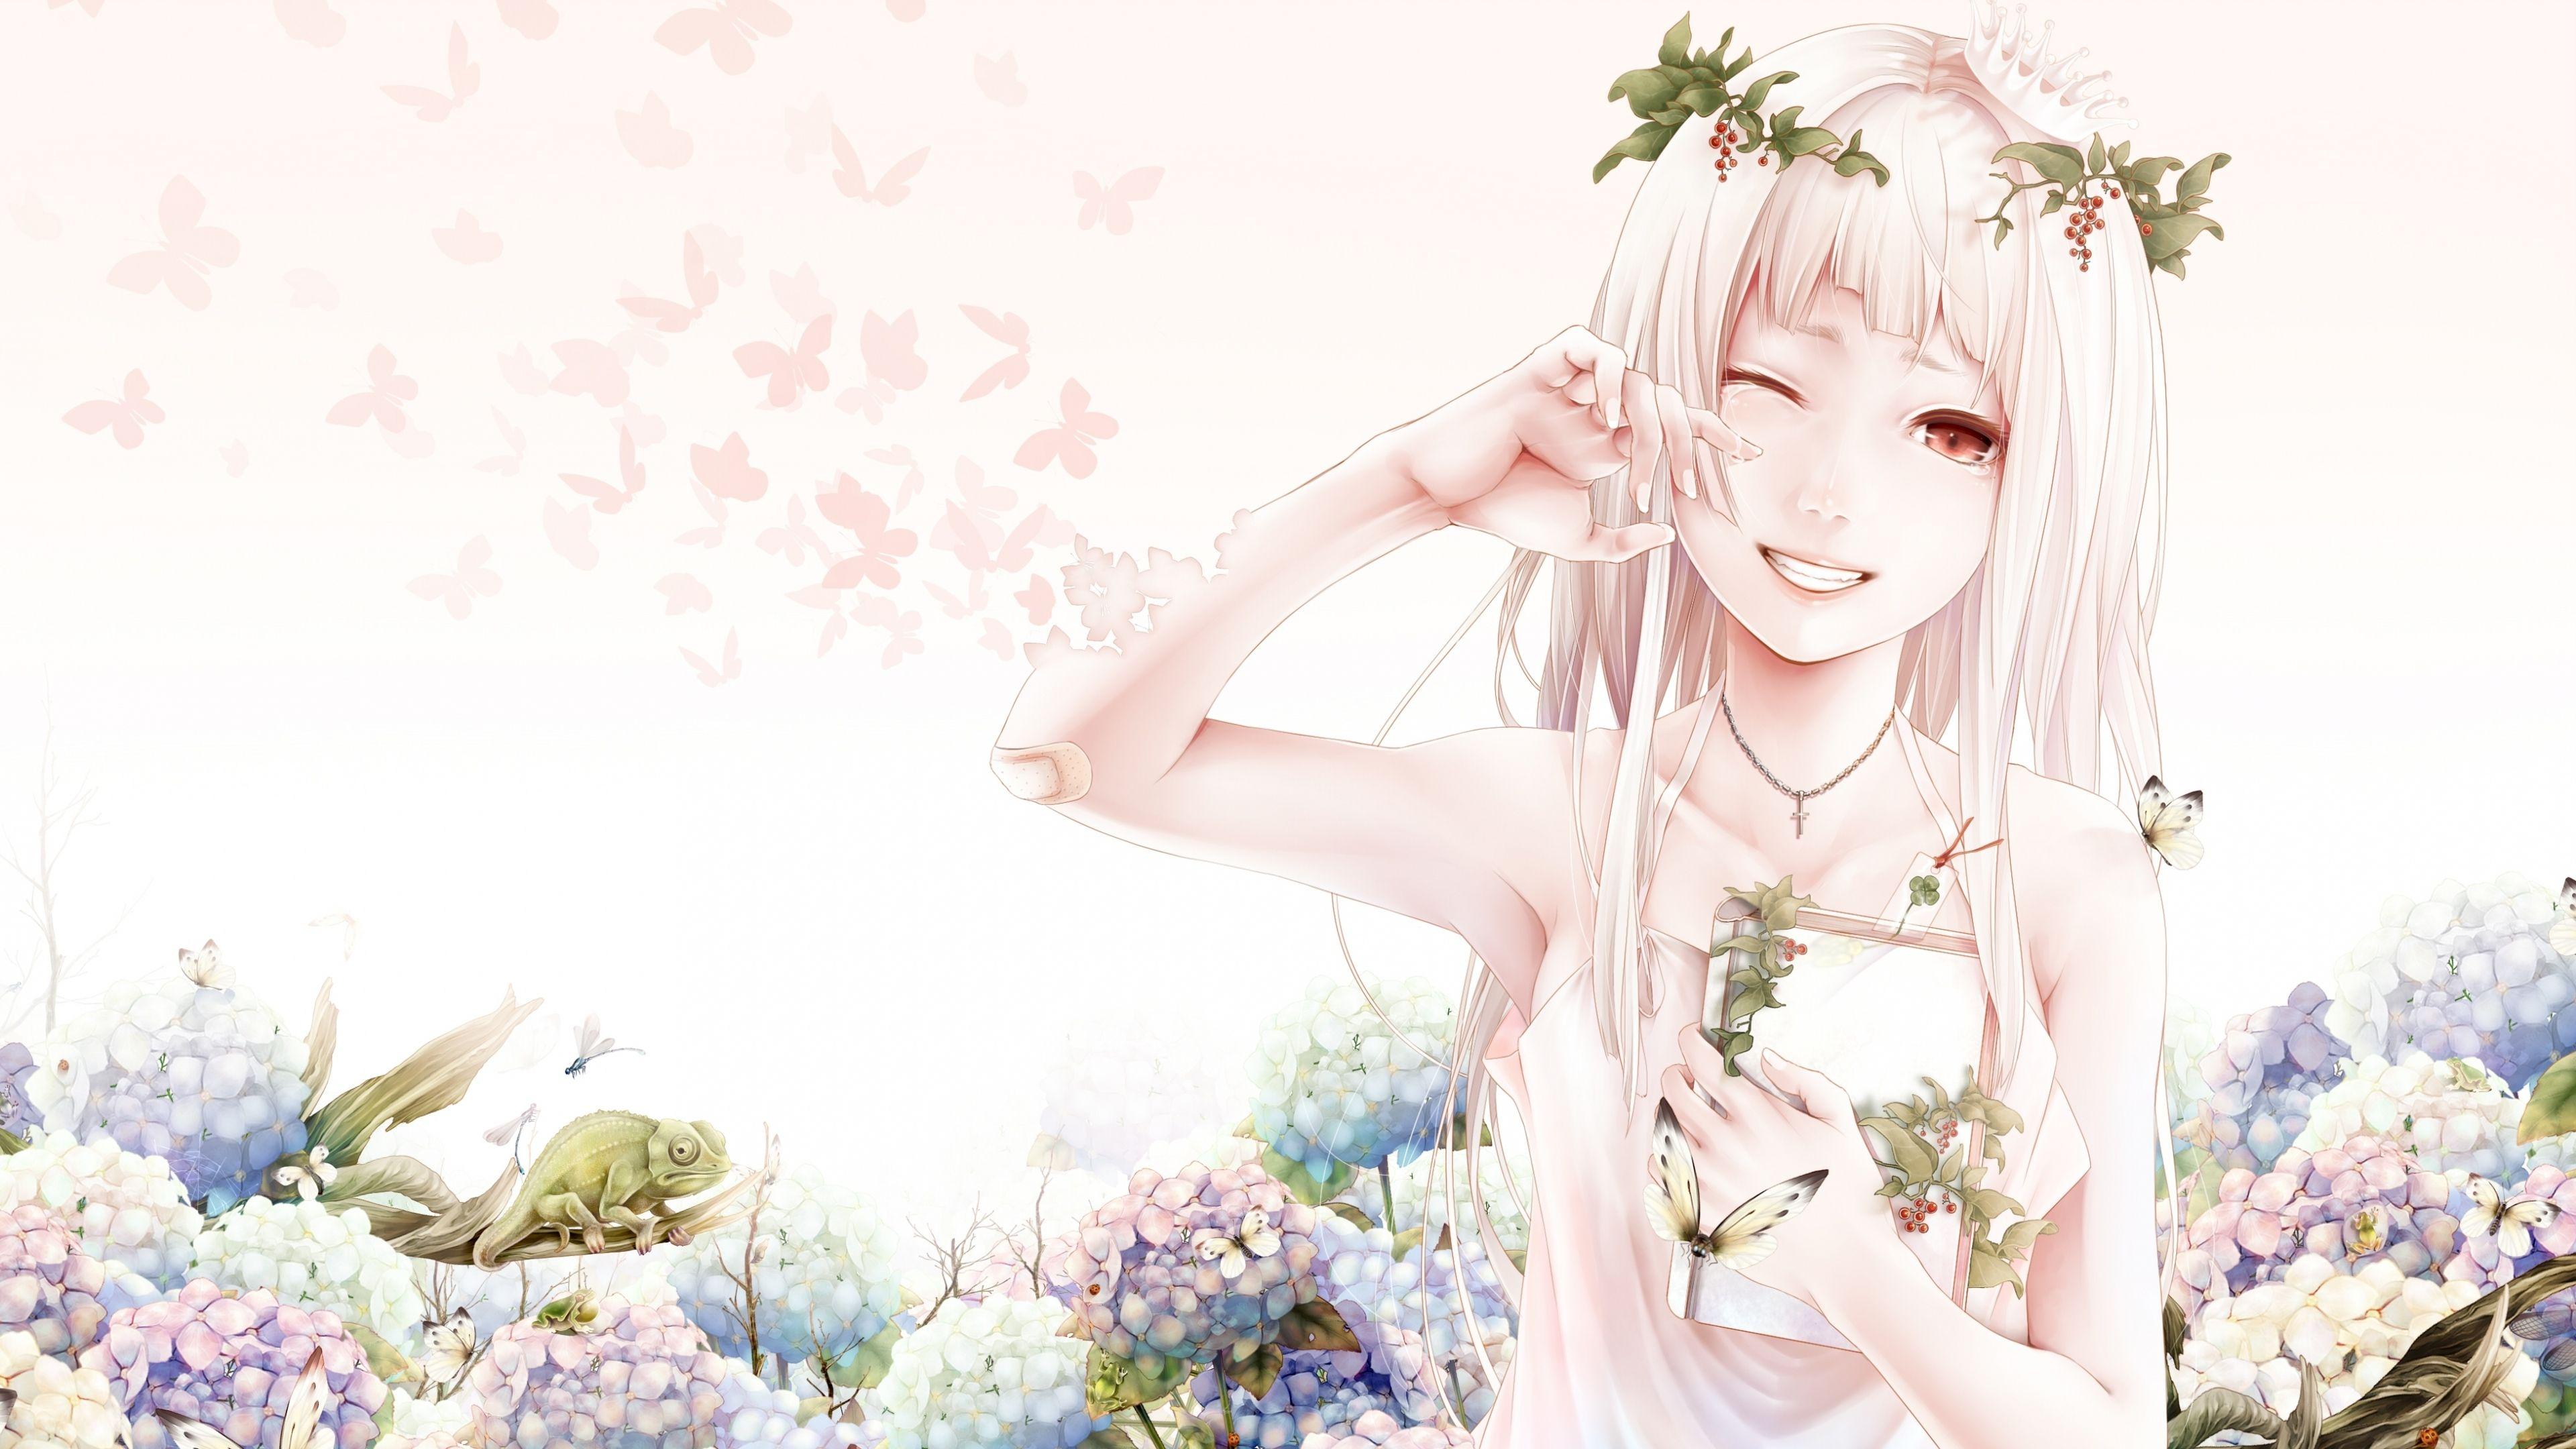 Wonderful Wallpaper Music Spring - 73d8e180358583352c827410ad8d7521  Gallery_818333.jpg